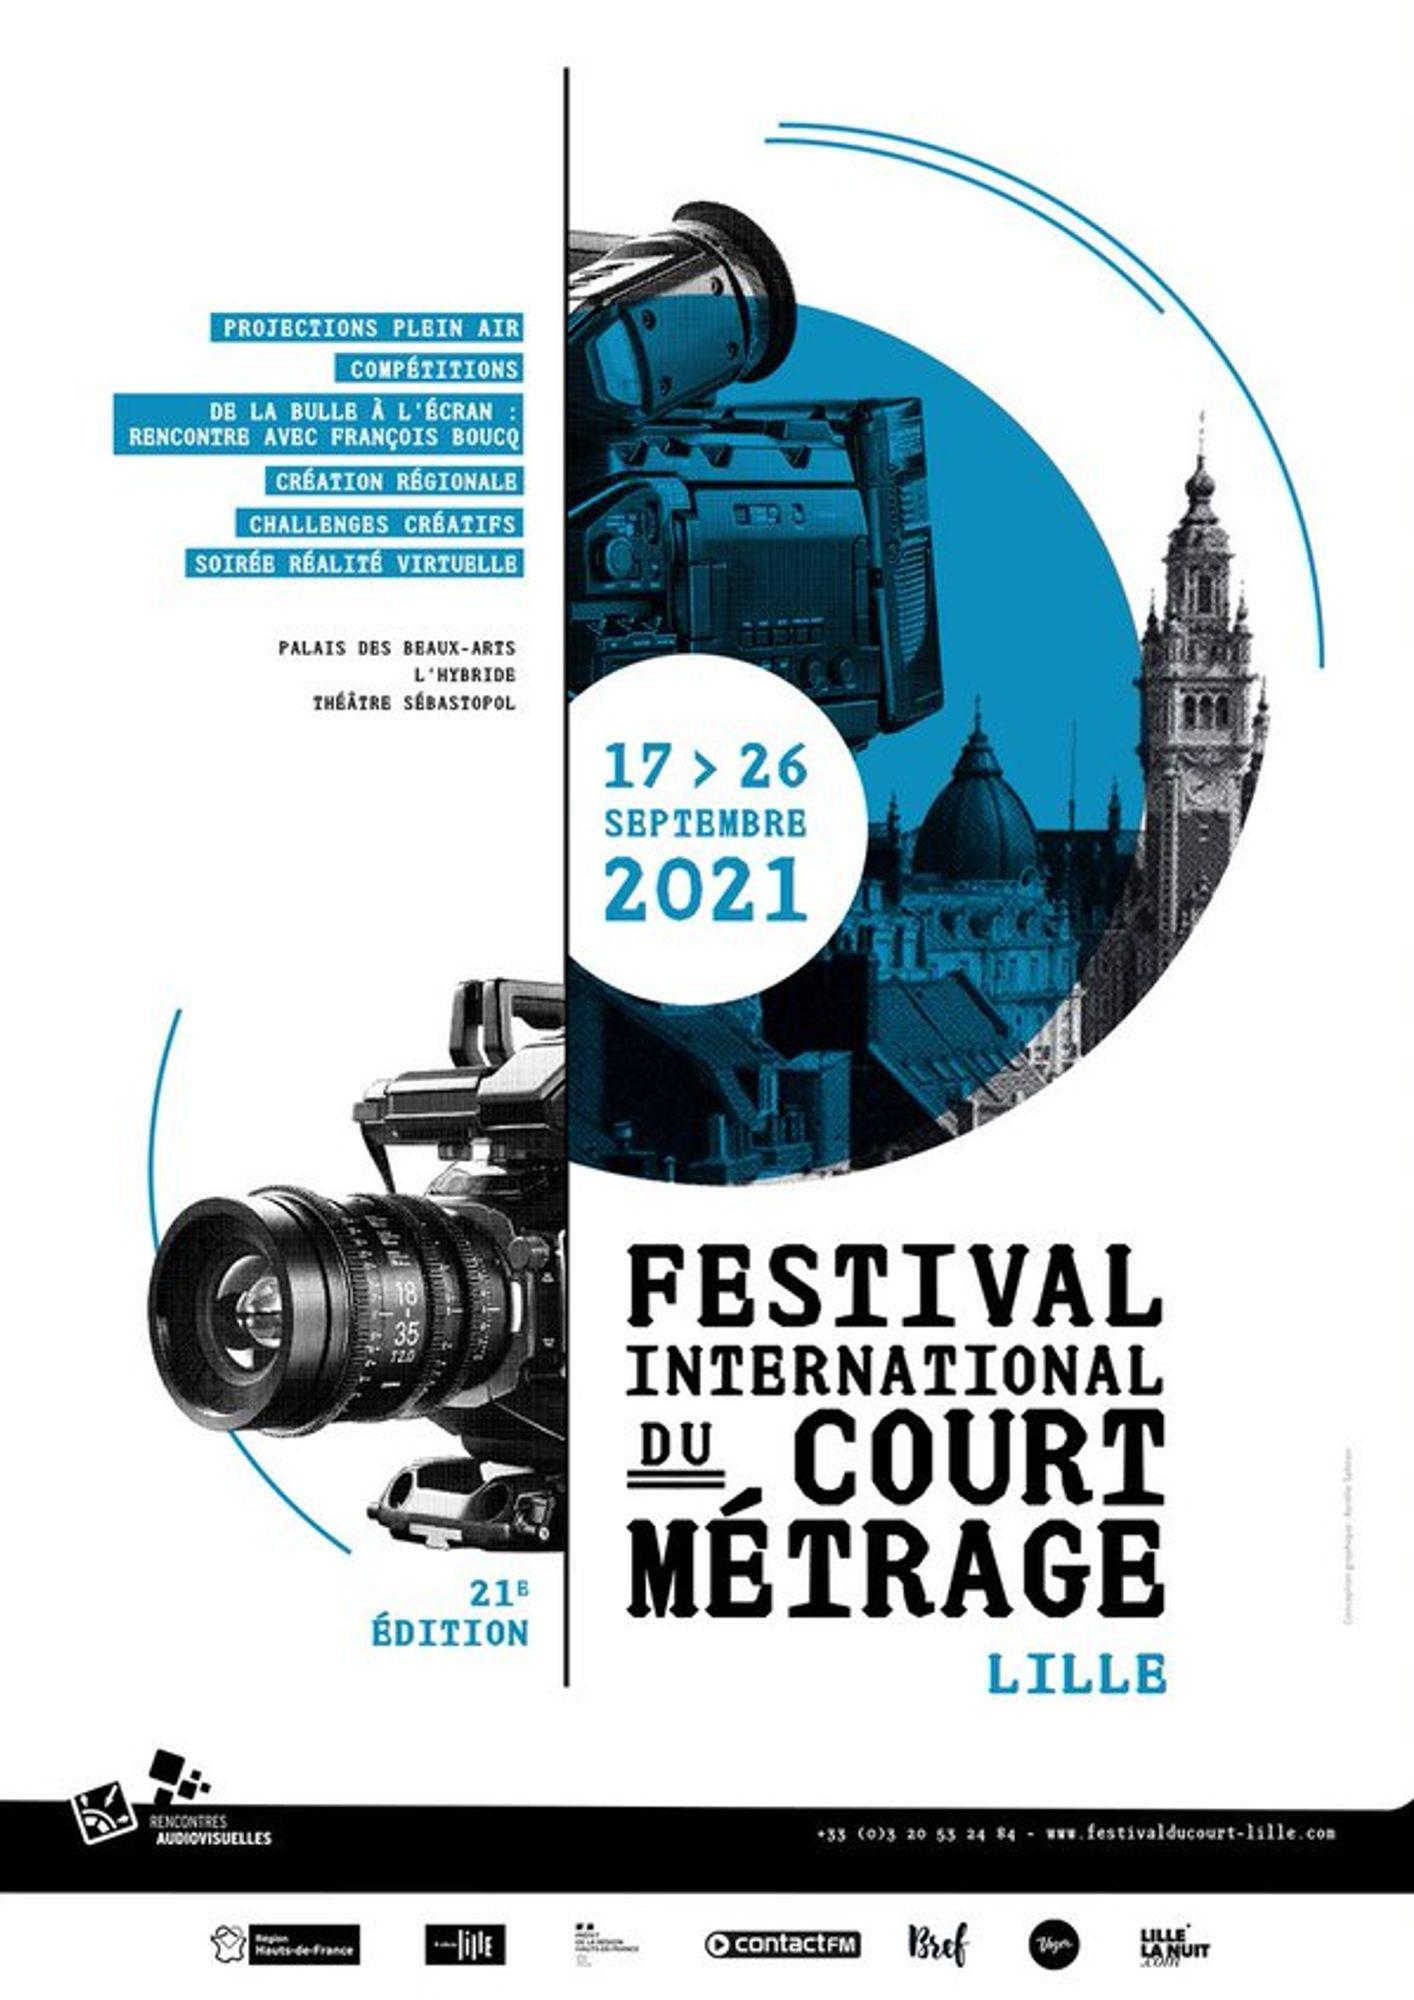 FESTIVAL INTERNATIONAL DU COURT METRAGE A LILLE